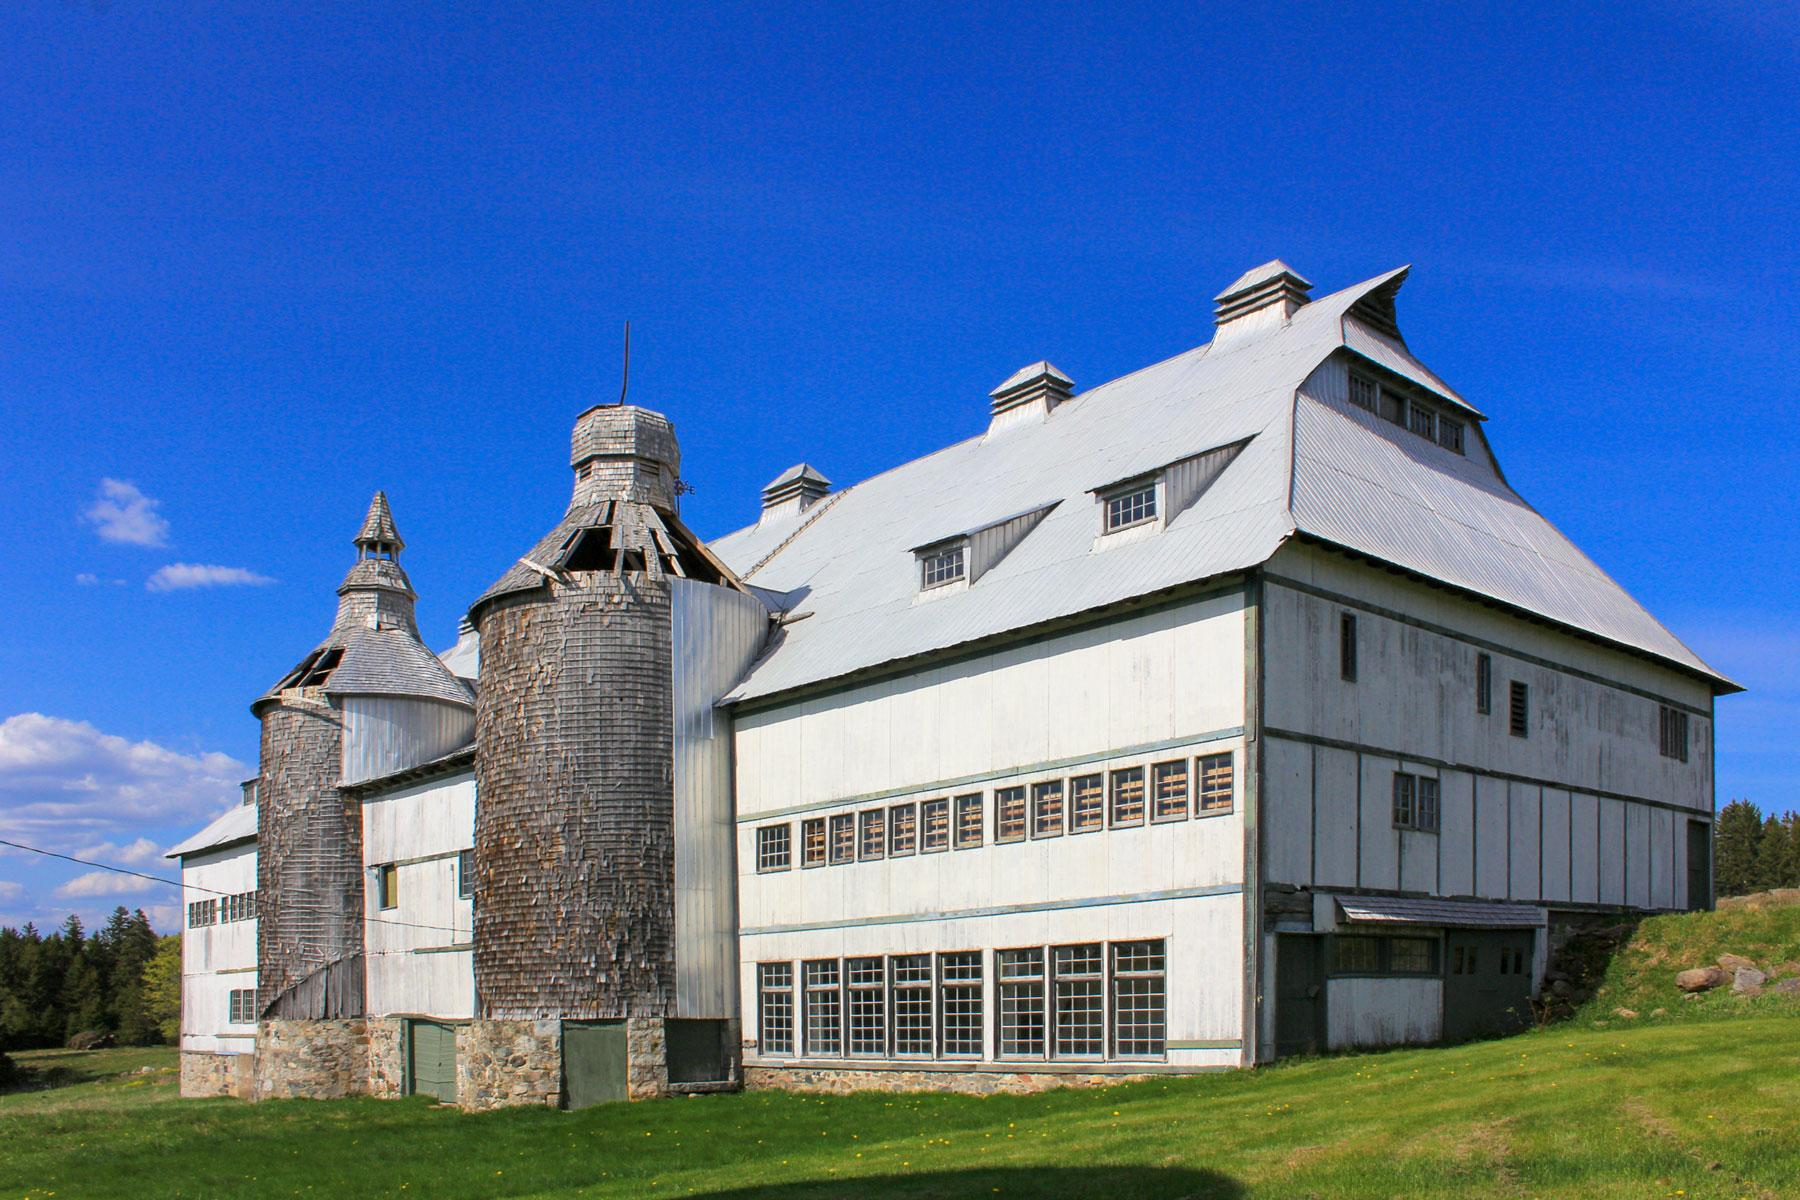 02_Historic_Sites_Atlantic_Canada_Minister's_Island_dreamstime_l_90634031